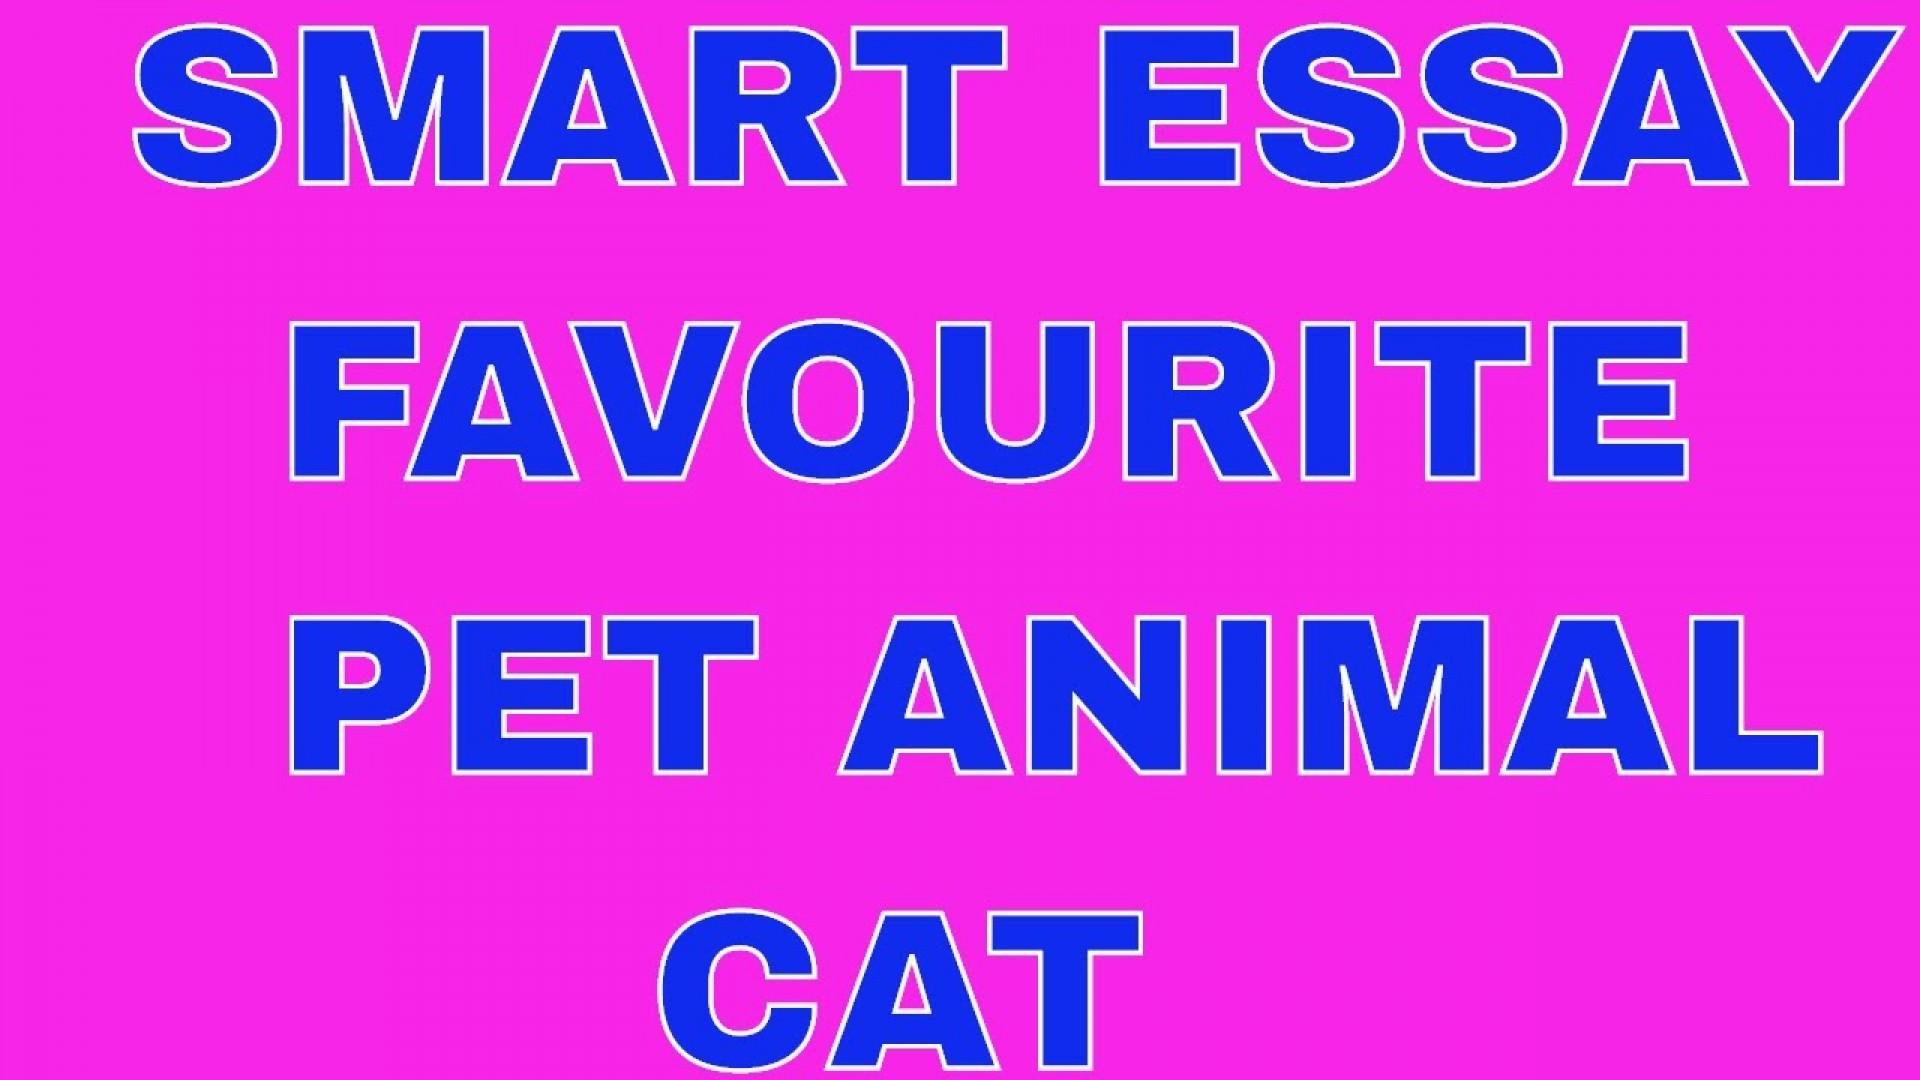 001 Essay Example Pet Animal Cat Dreaded My Favorite In English Tamil 1920